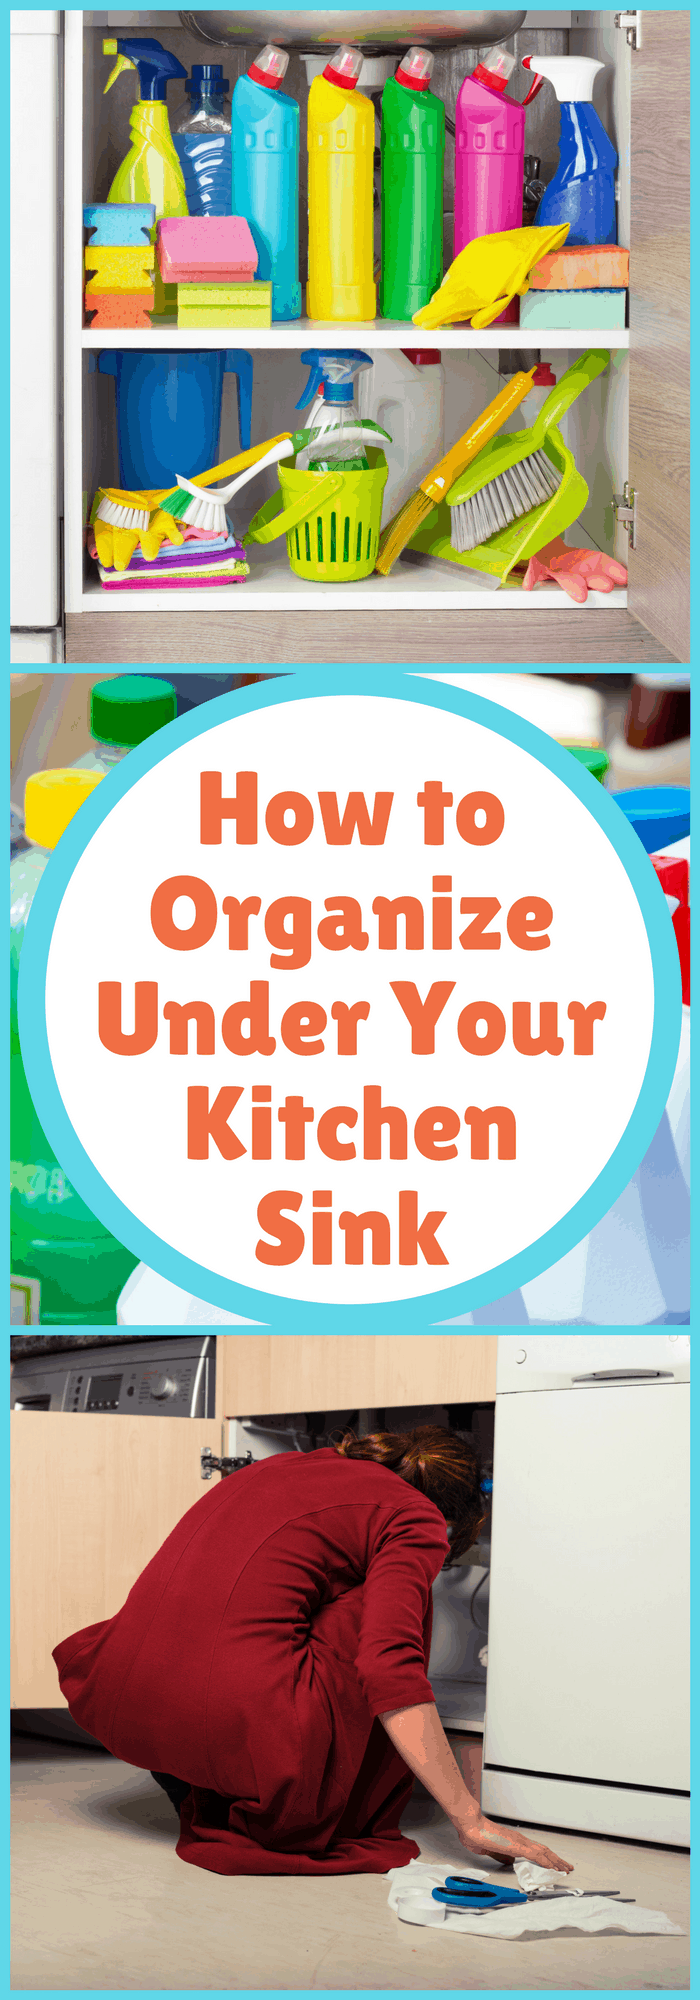 Organization--How to Organize Under Your Kitchen Sink--The Organized Mom